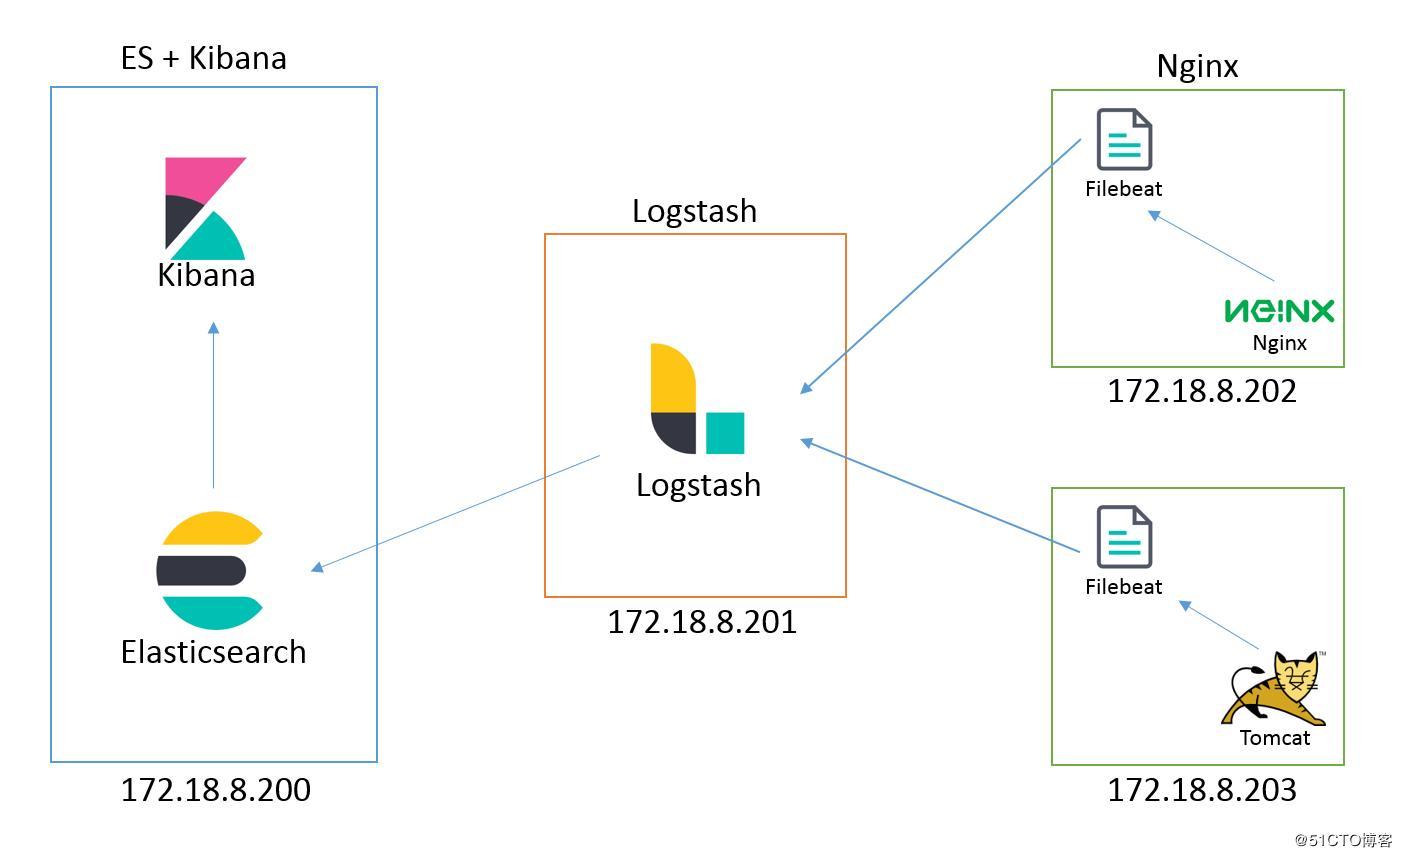 ELK + Filebeat + Nginx centralized log analysis platform (1